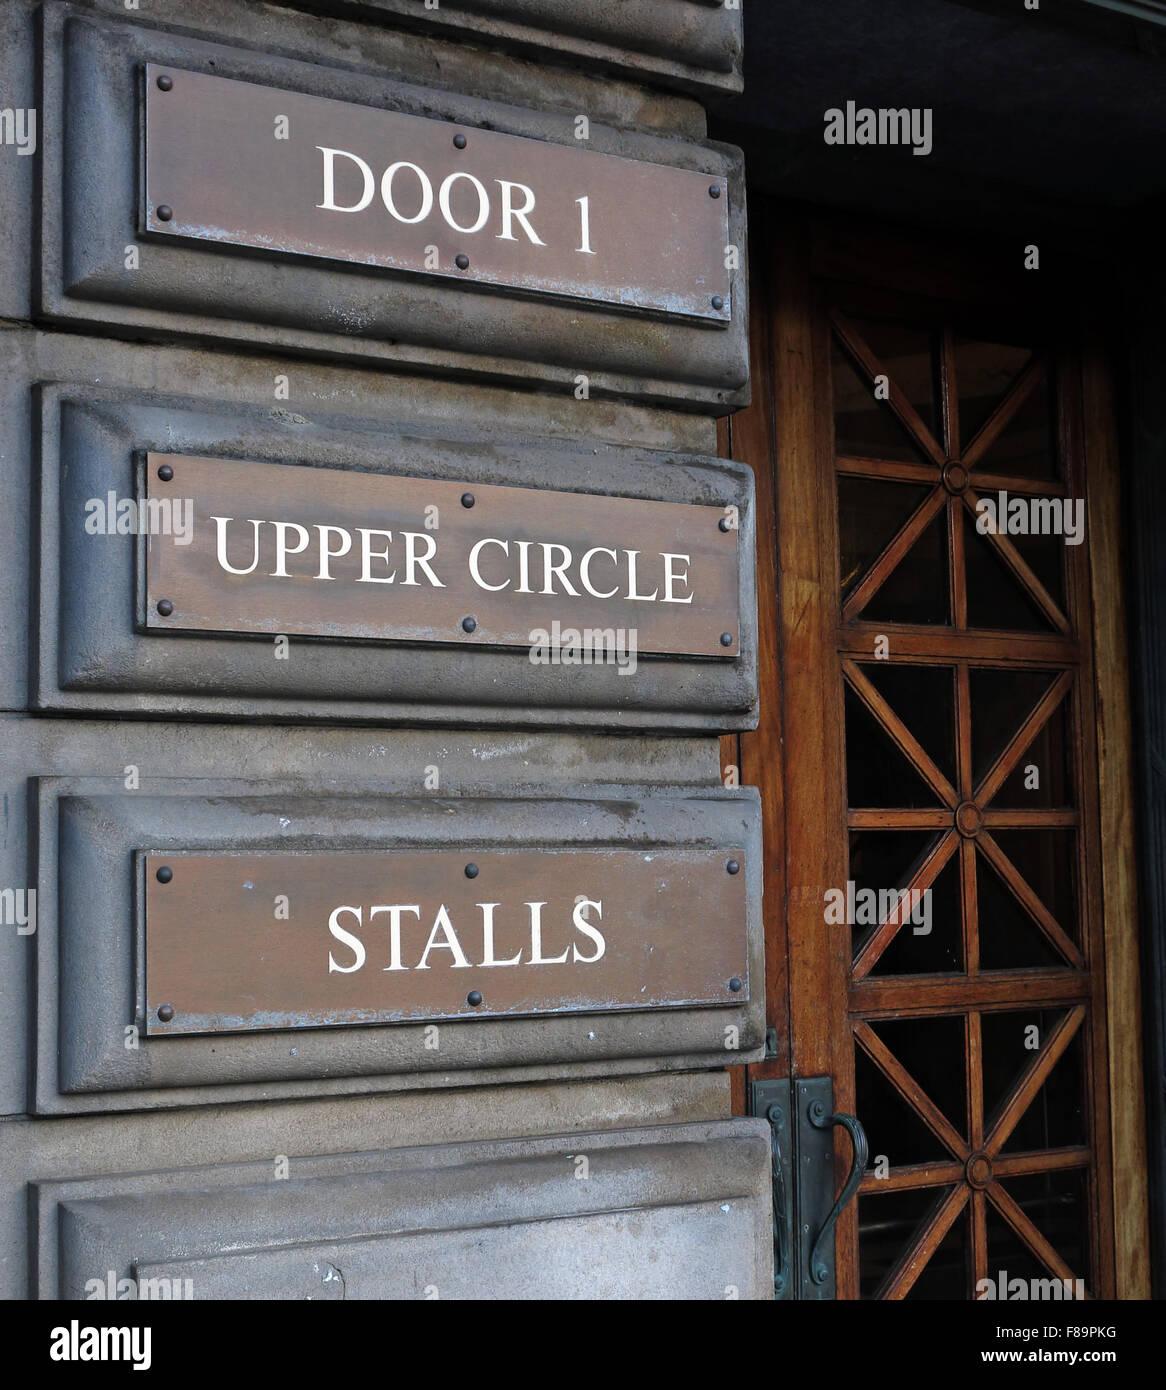 Laden Sie dieses Alamy Stockfoto Usher Hall Tür 1 - Upper Circle, Stände, Lothian Road, Edinburgh, Scotland, UK - F89PKG